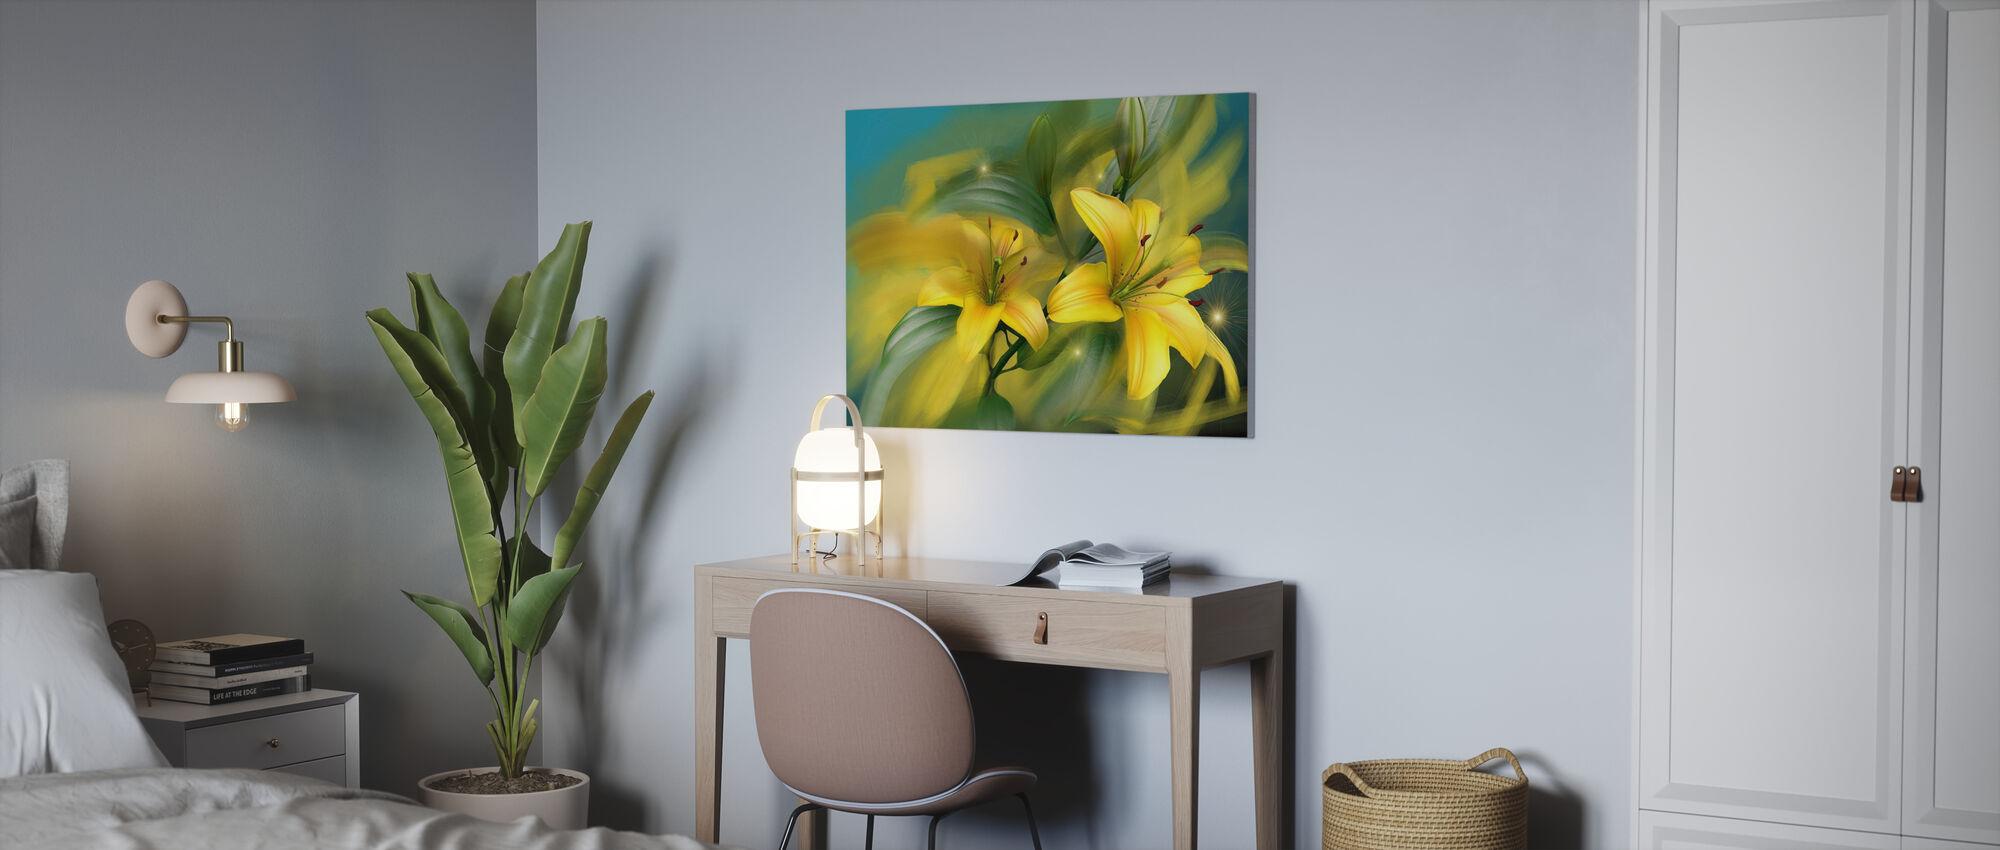 Flower Power - Canvas print - Office